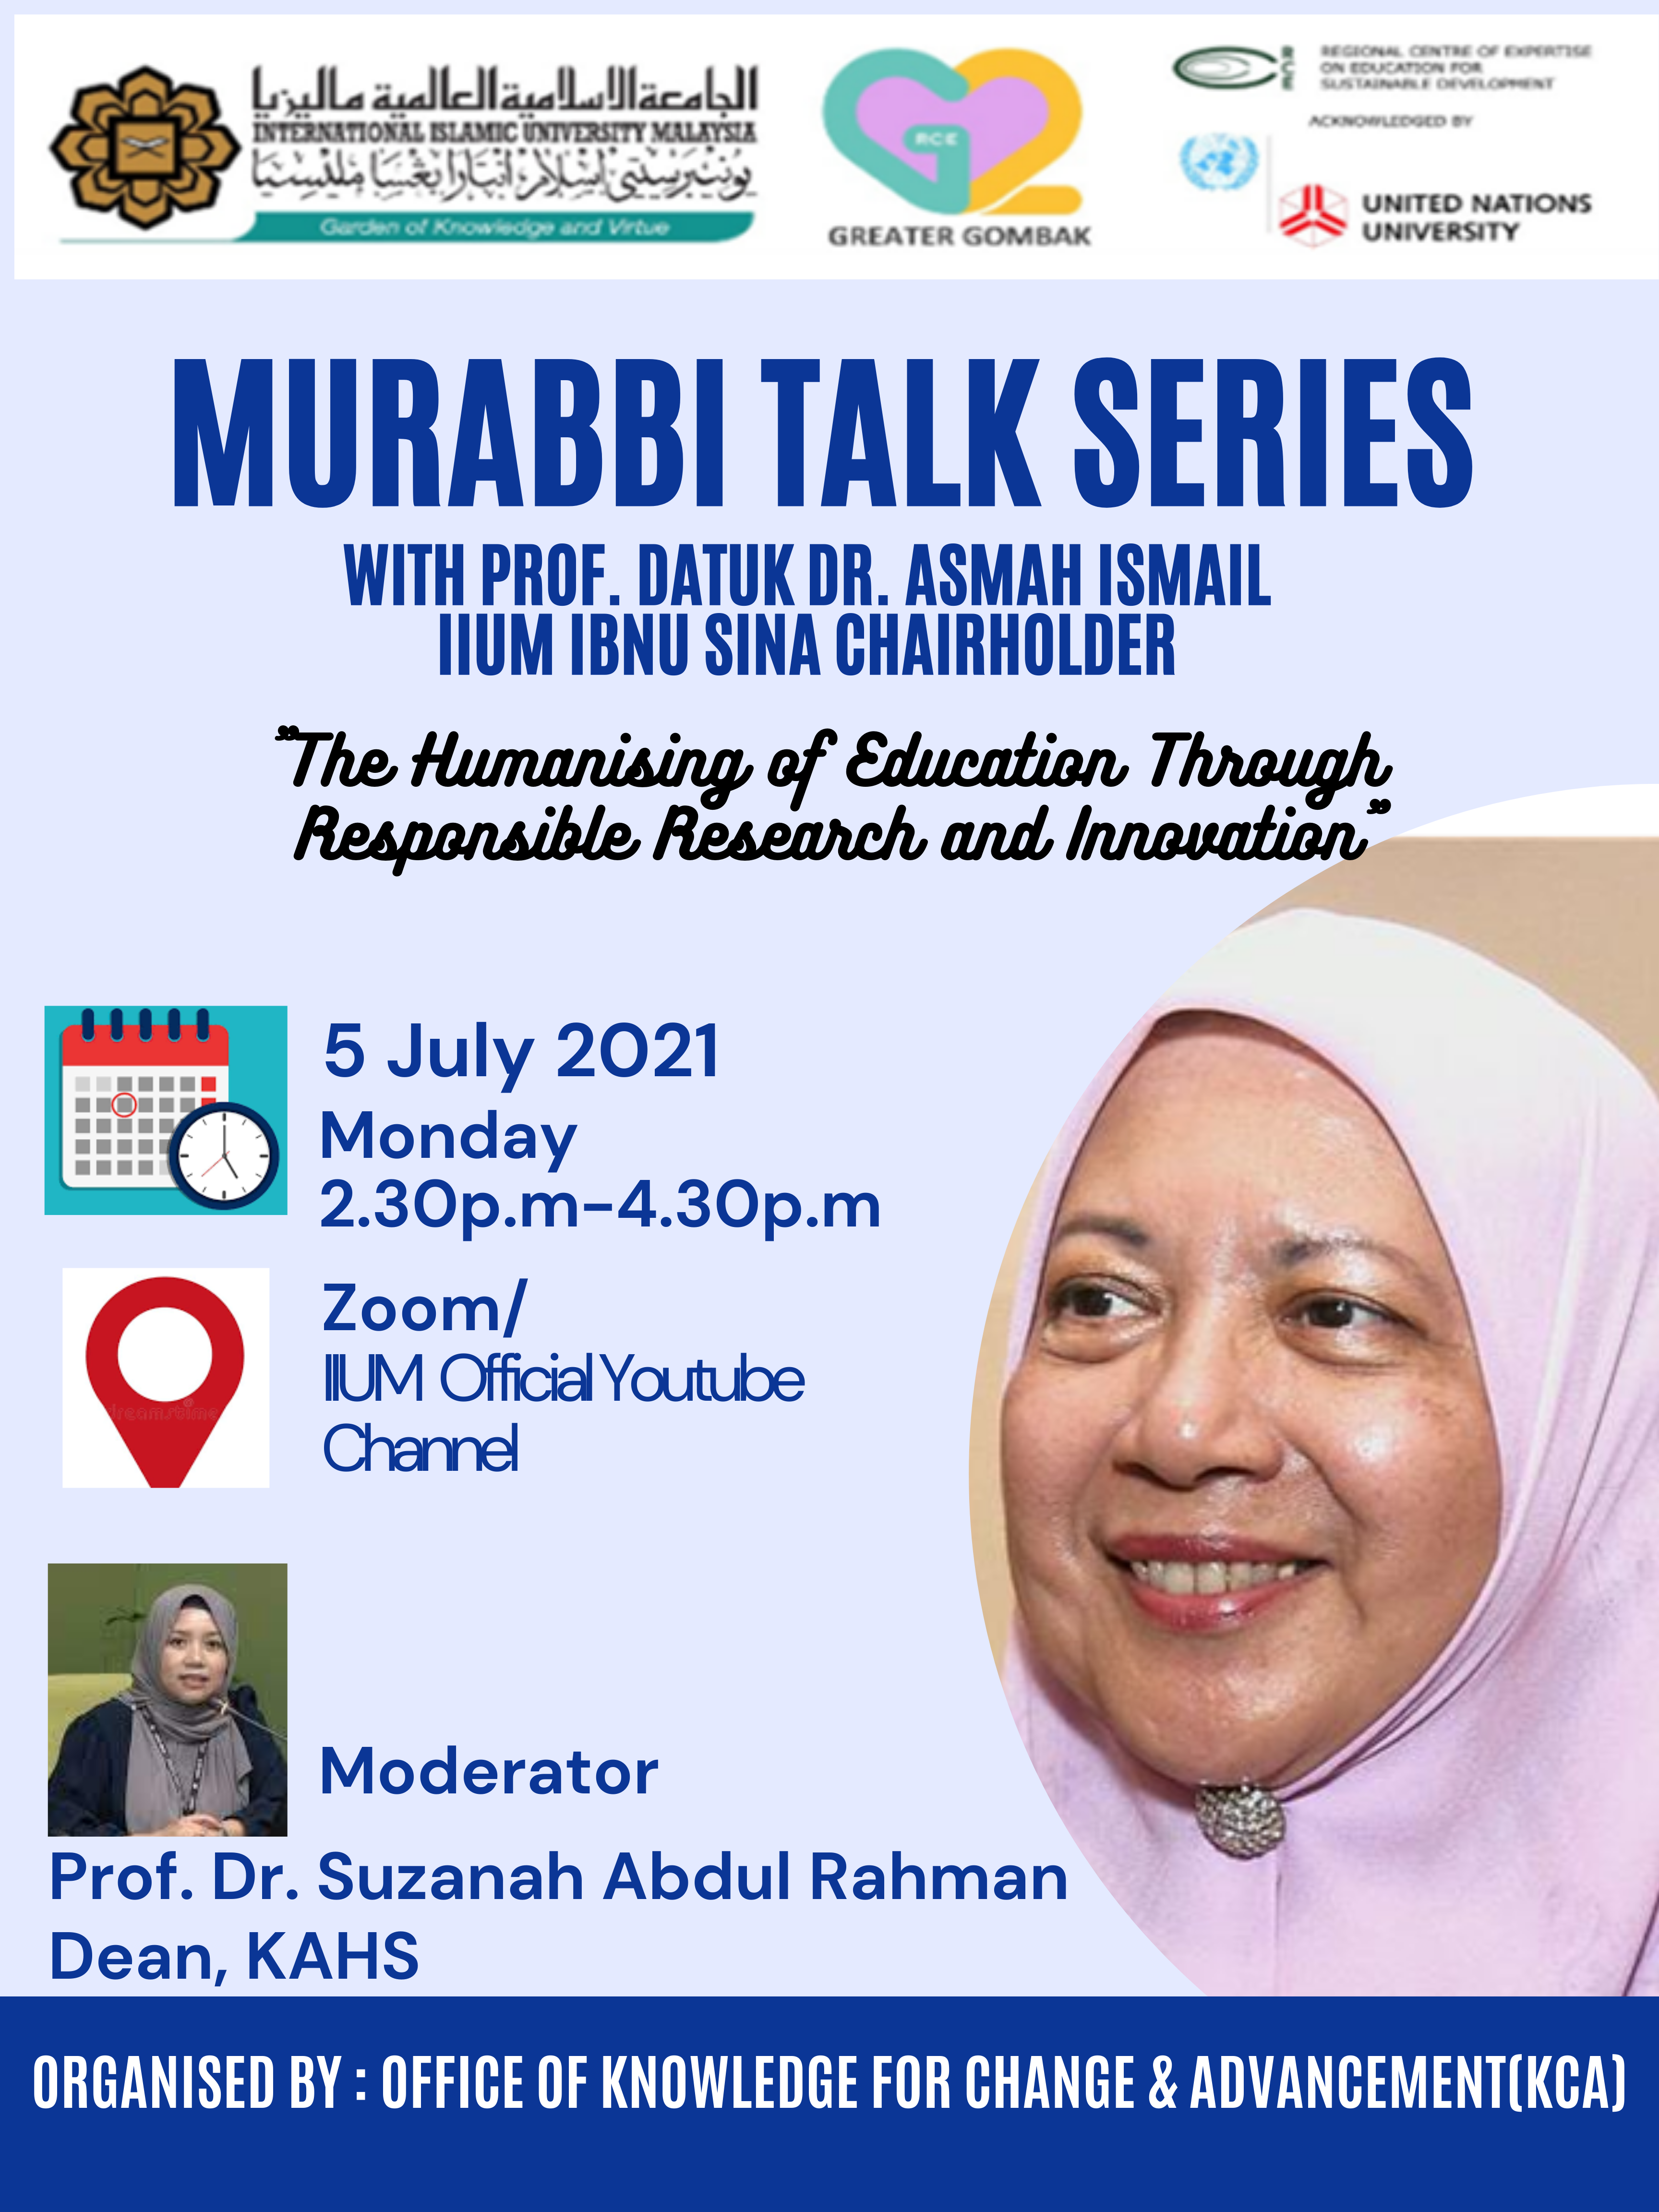 Murabbi Talk Series with Y.Bhg. Prof. Datuk Dr. Asma Ismail, Ibn Sina Chair Holder